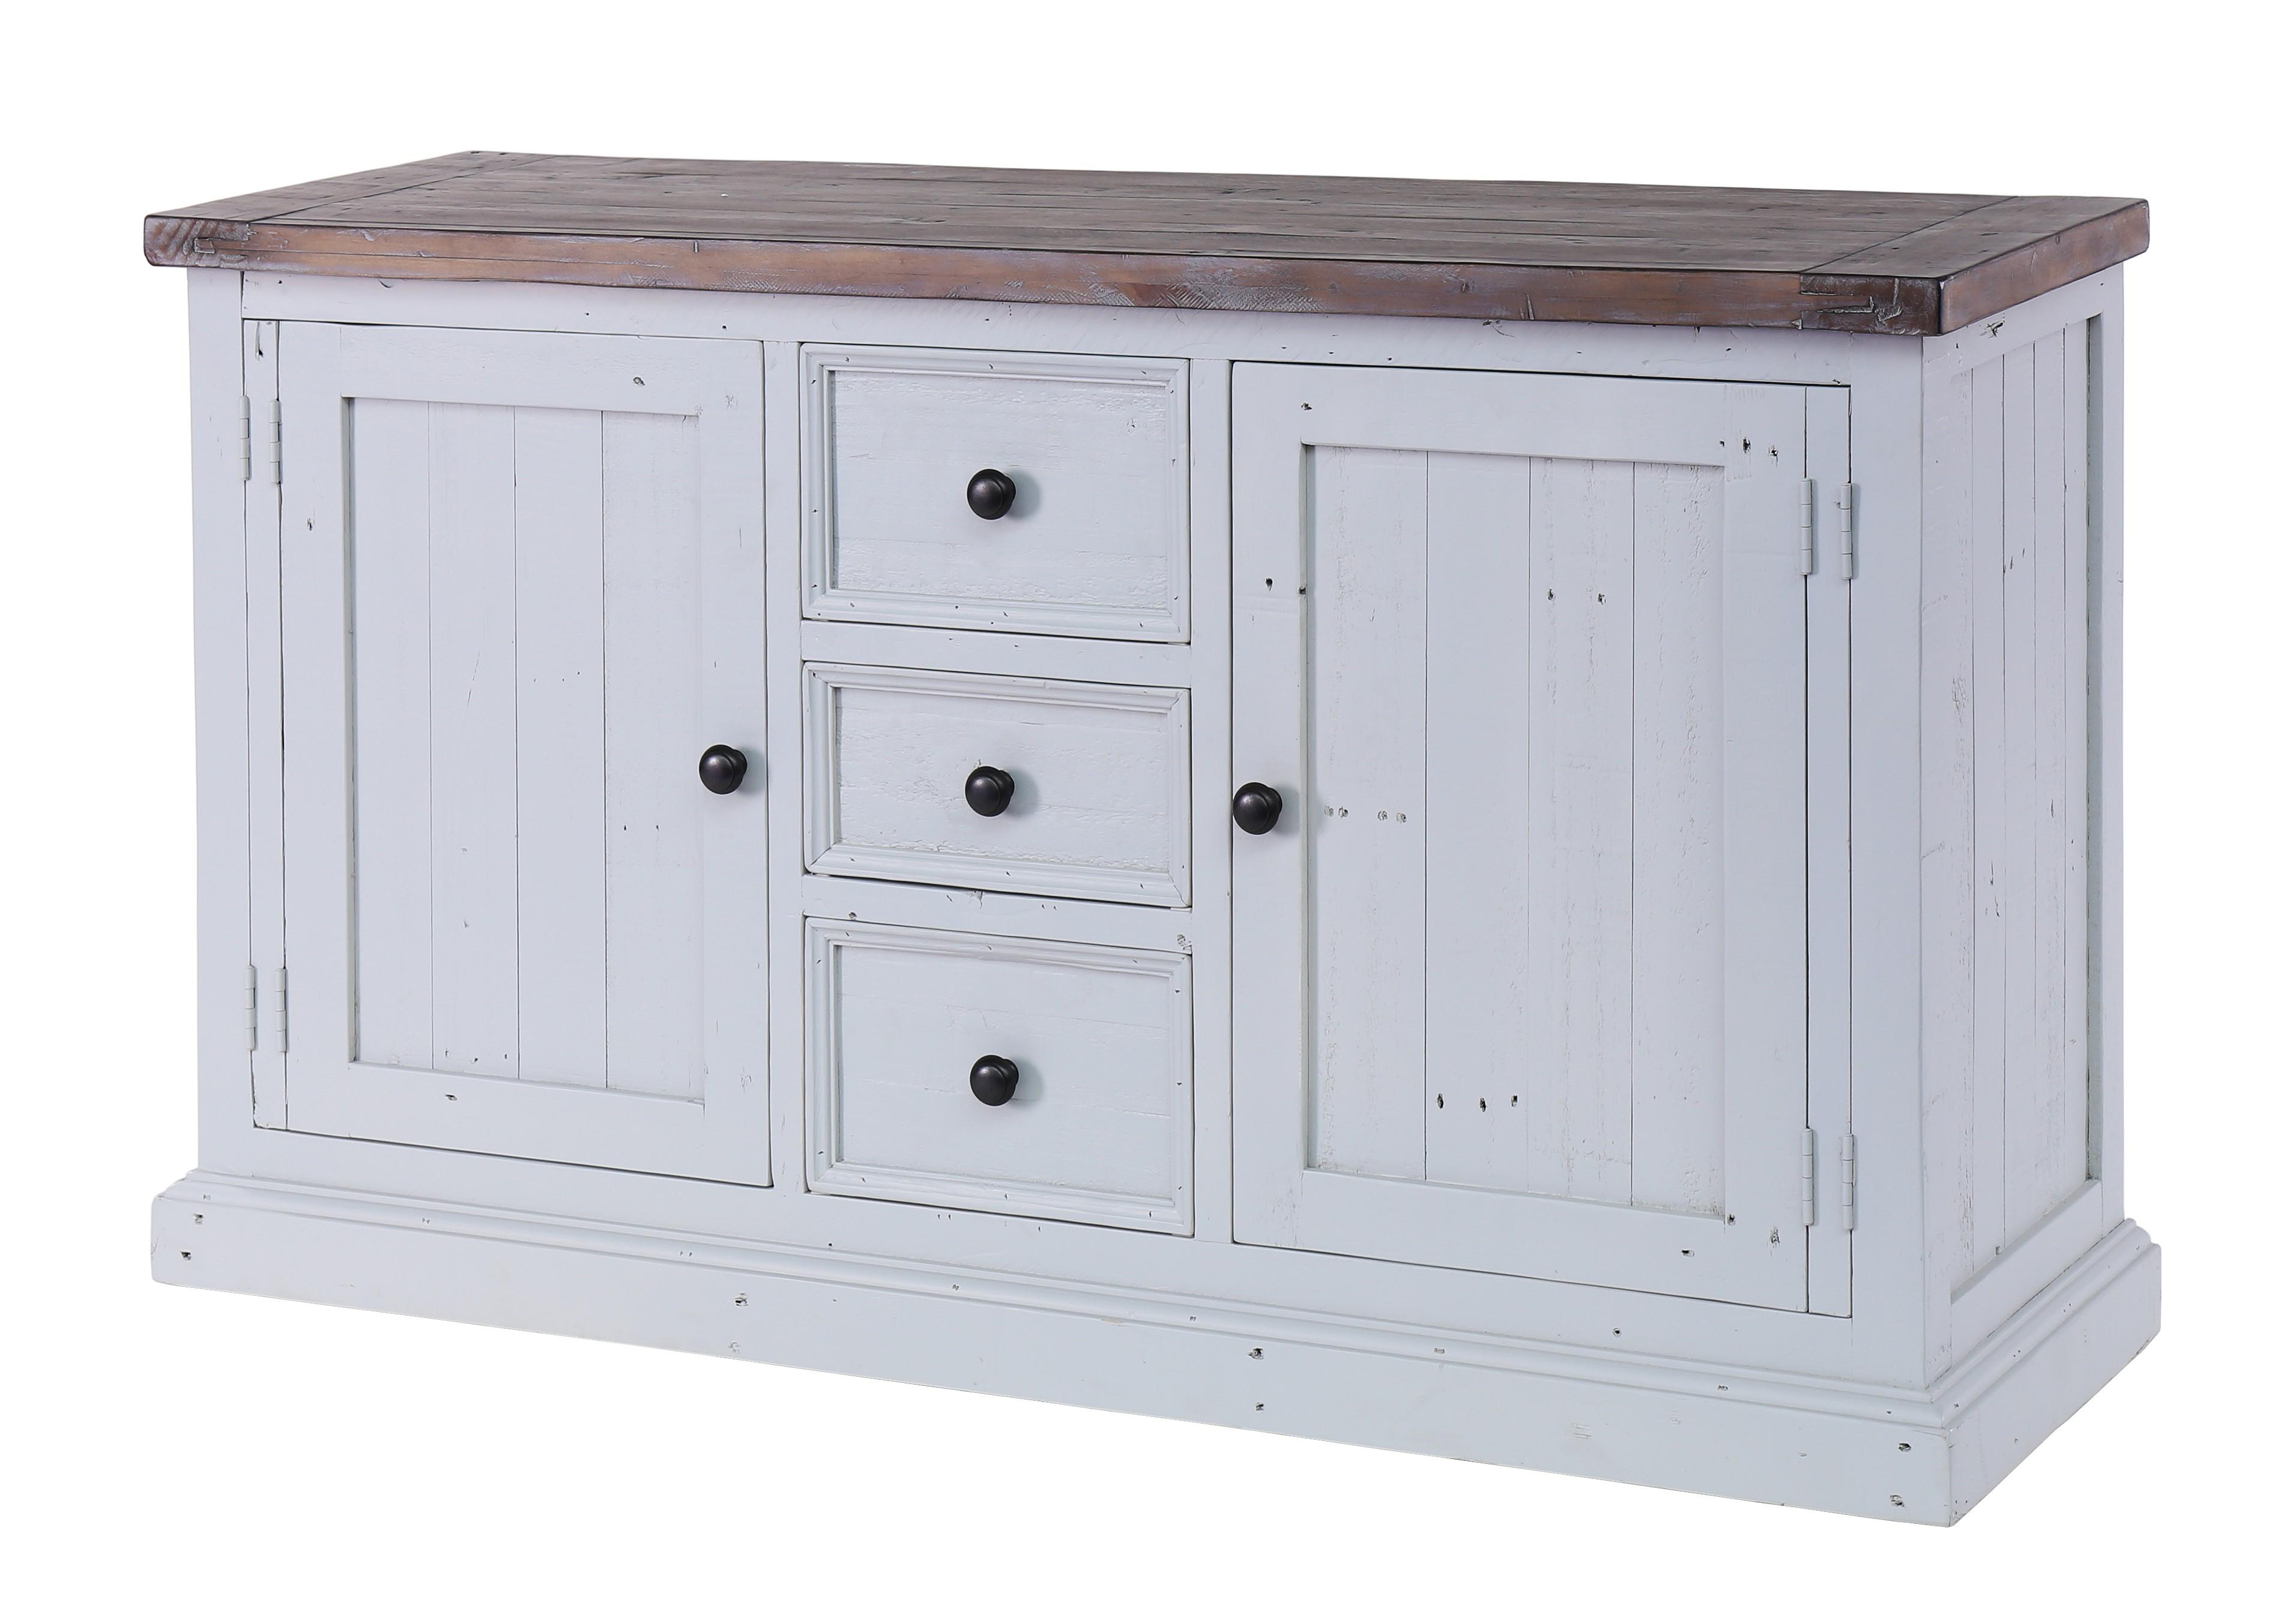 Besp Oak Hampton Wide Sideboard – 2 Doors, 3 Drawers – Style Our Home Regarding Most Recent Aged Pine 3 Drawer 2 Door Sideboards (View 4 of 20)